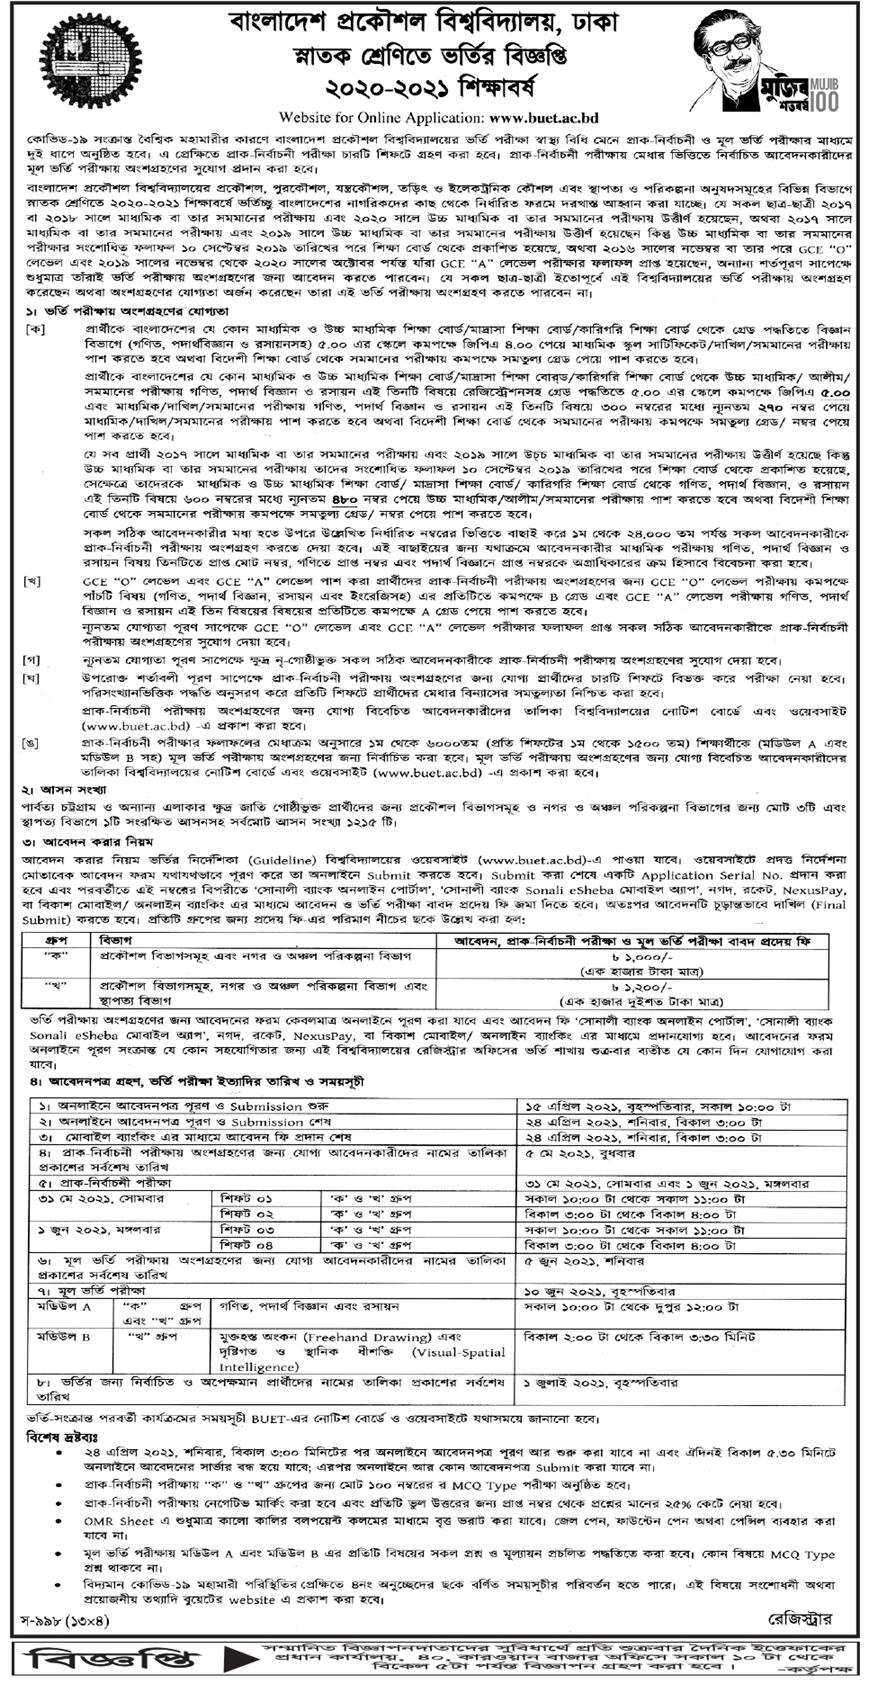 BUET Admission Circular 2020-21 pdf